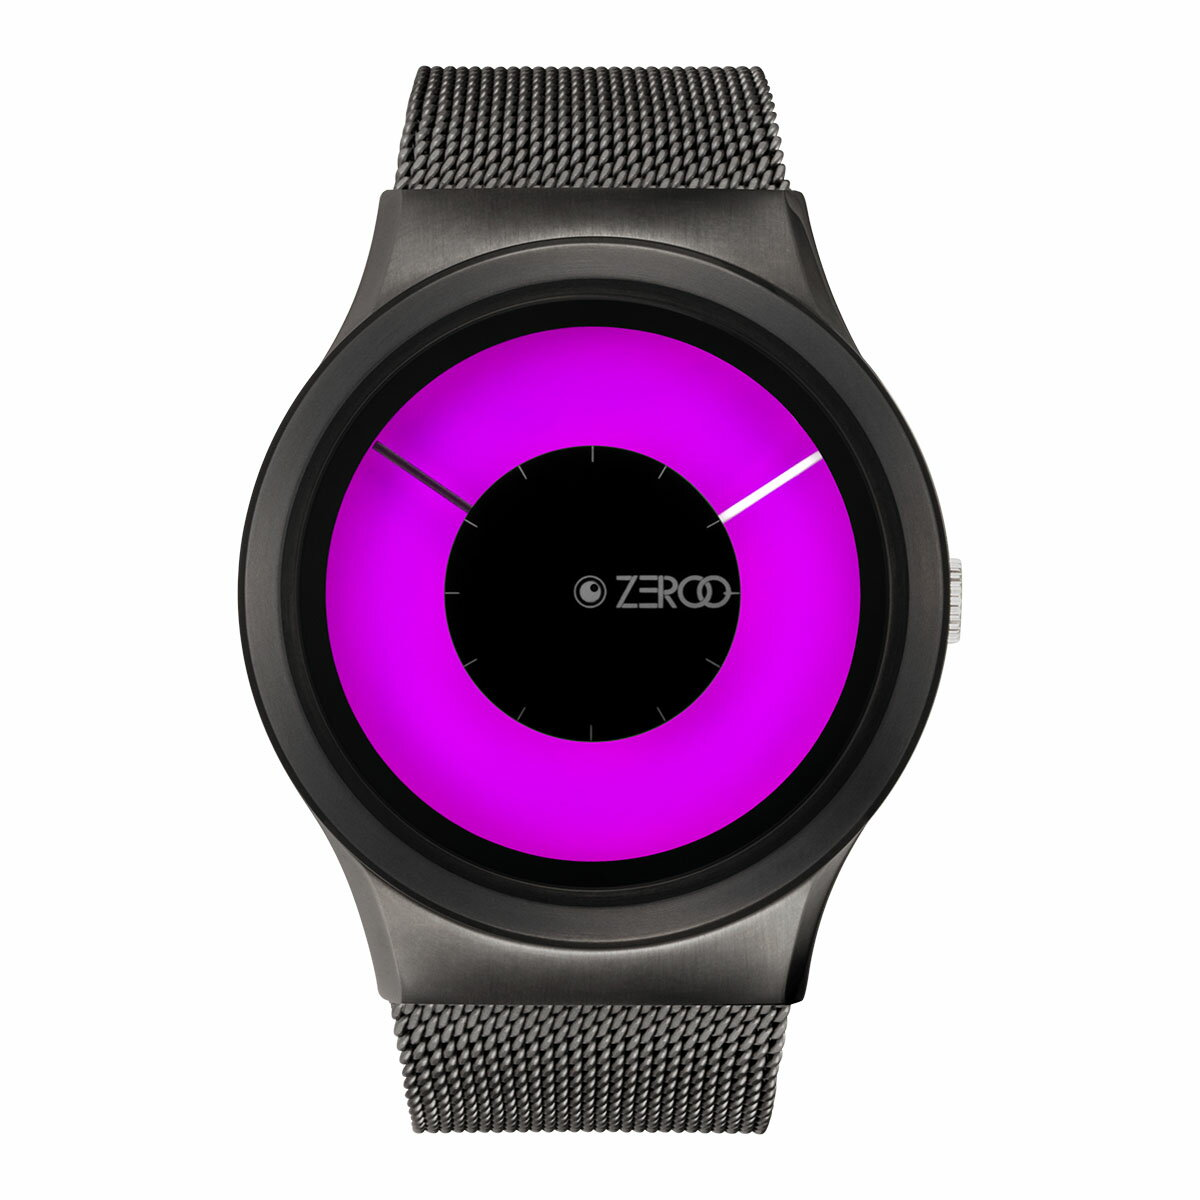 ZEROO MAGIA AURORA ゼロ 電池式クォーツ 腕時計 [W11025B02SM02] ピンク デザインウォッチ ペア用 メンズ レディース ユニセックス おしゃれ時計 デザイナーズ